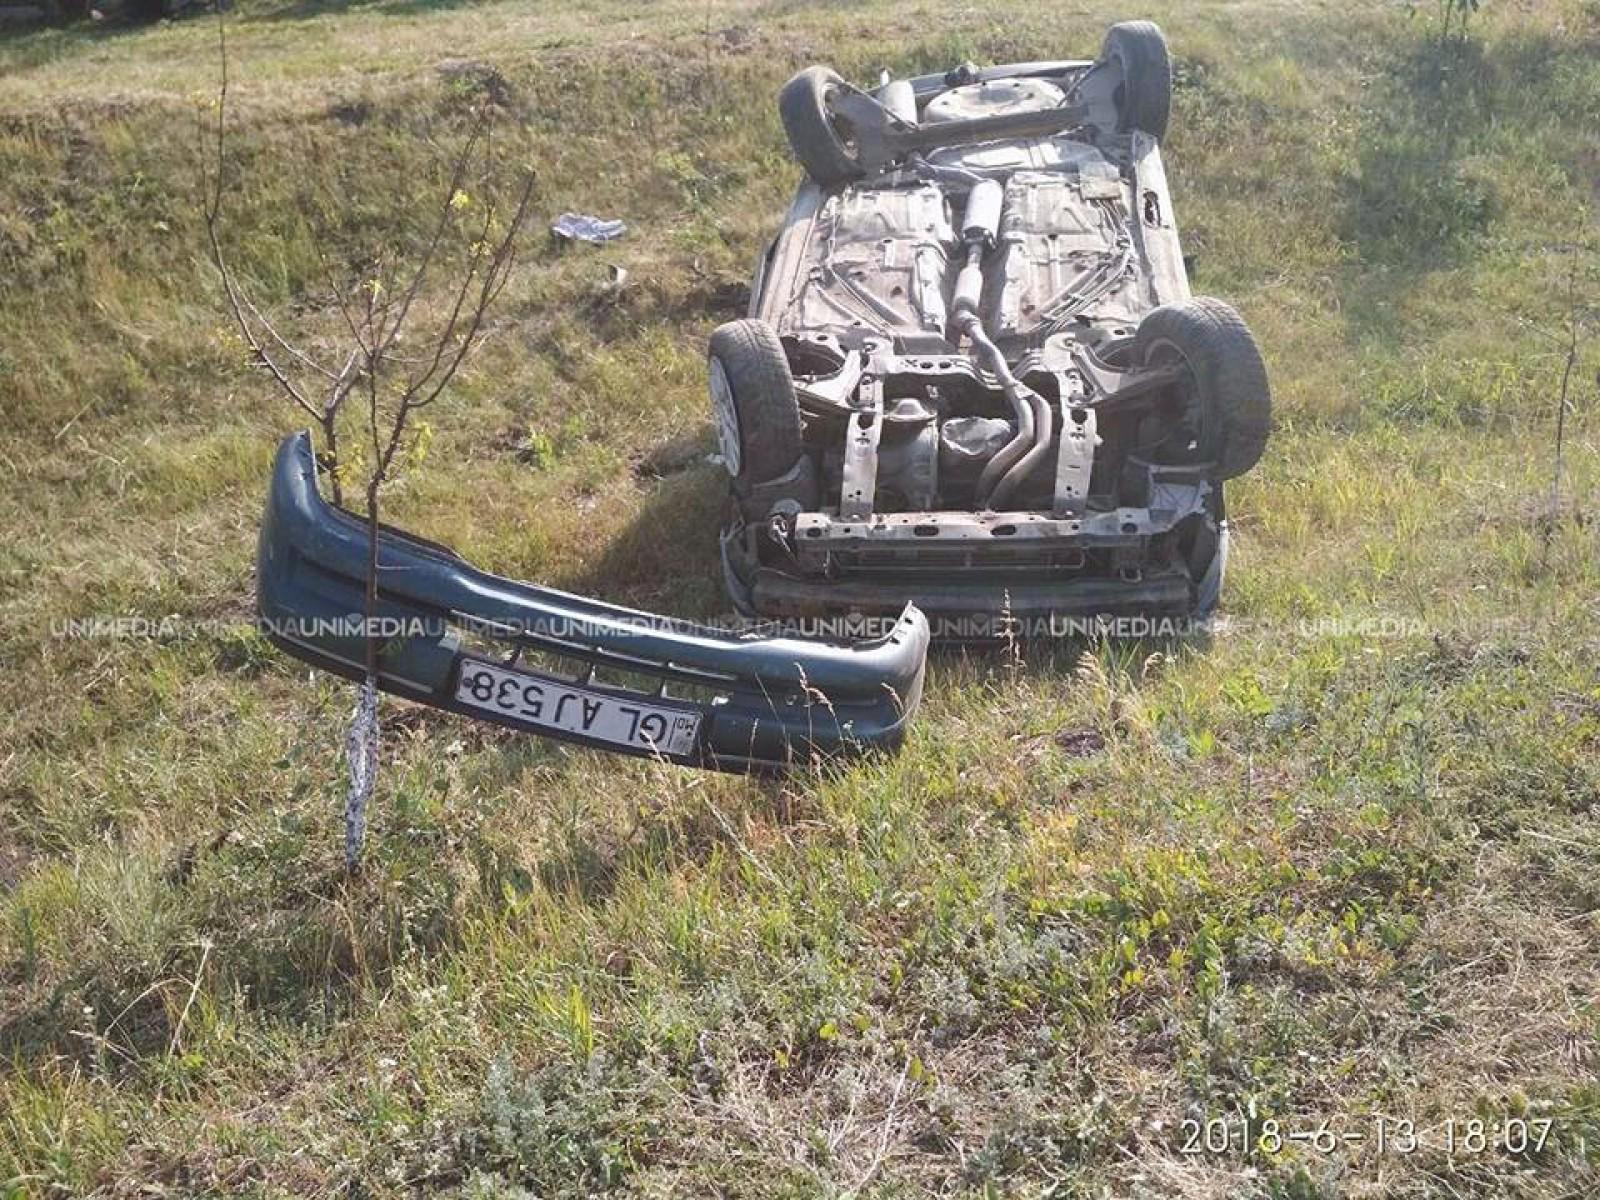 (foto) Două automobile s-au tamponat violent la Glodeni: Un copil de trei ani, spitalizat